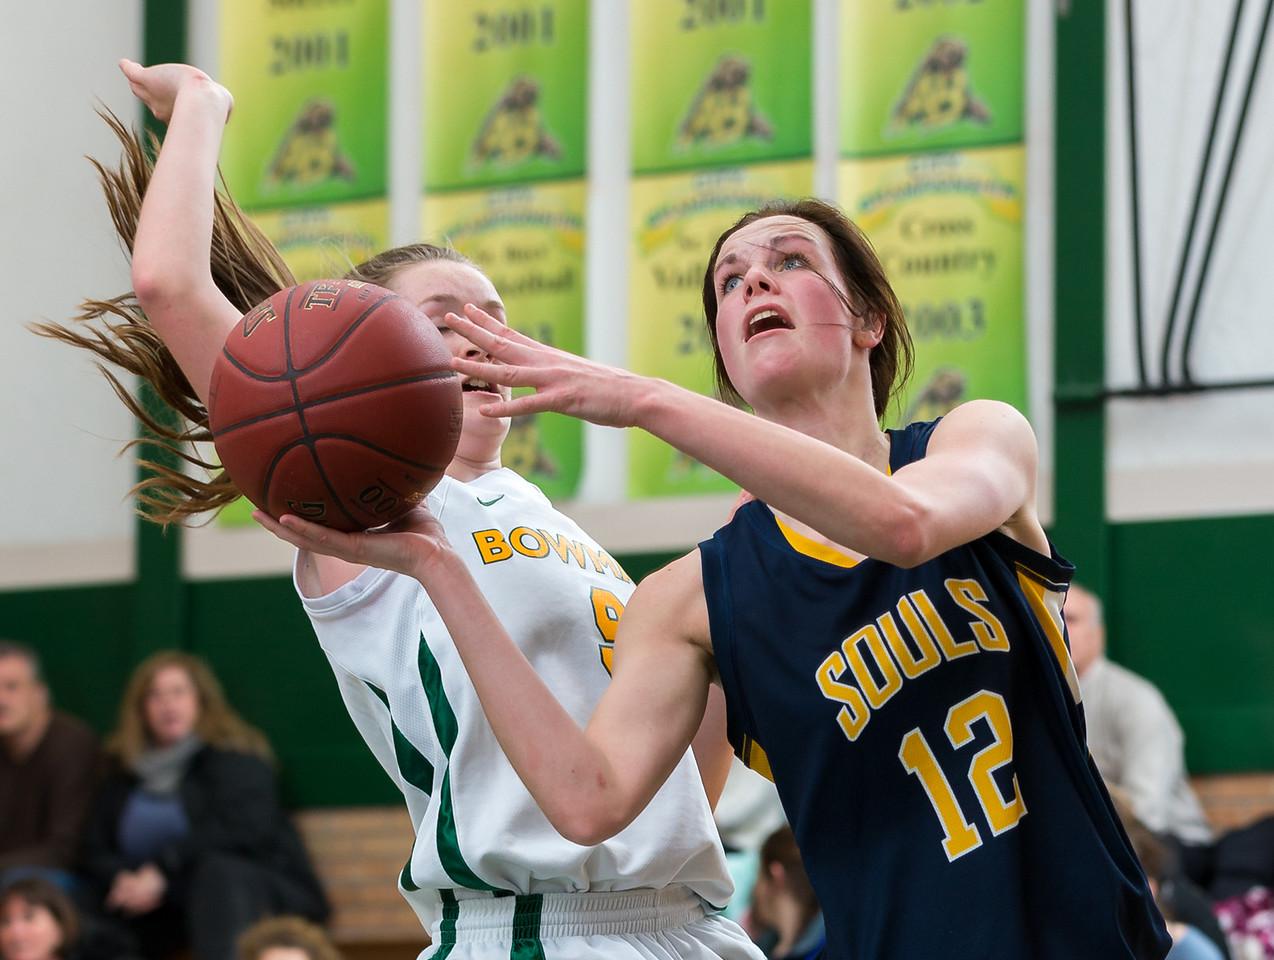 IMAGE: http://www.justsportsphotography.ca/Photos/Saskatoon-High-School-Basketball/2014-15/Girls/Souls-v-Bears/i-6tcHwxH/0/X2/Souls%20v%20Bears%200073-X2.jpg